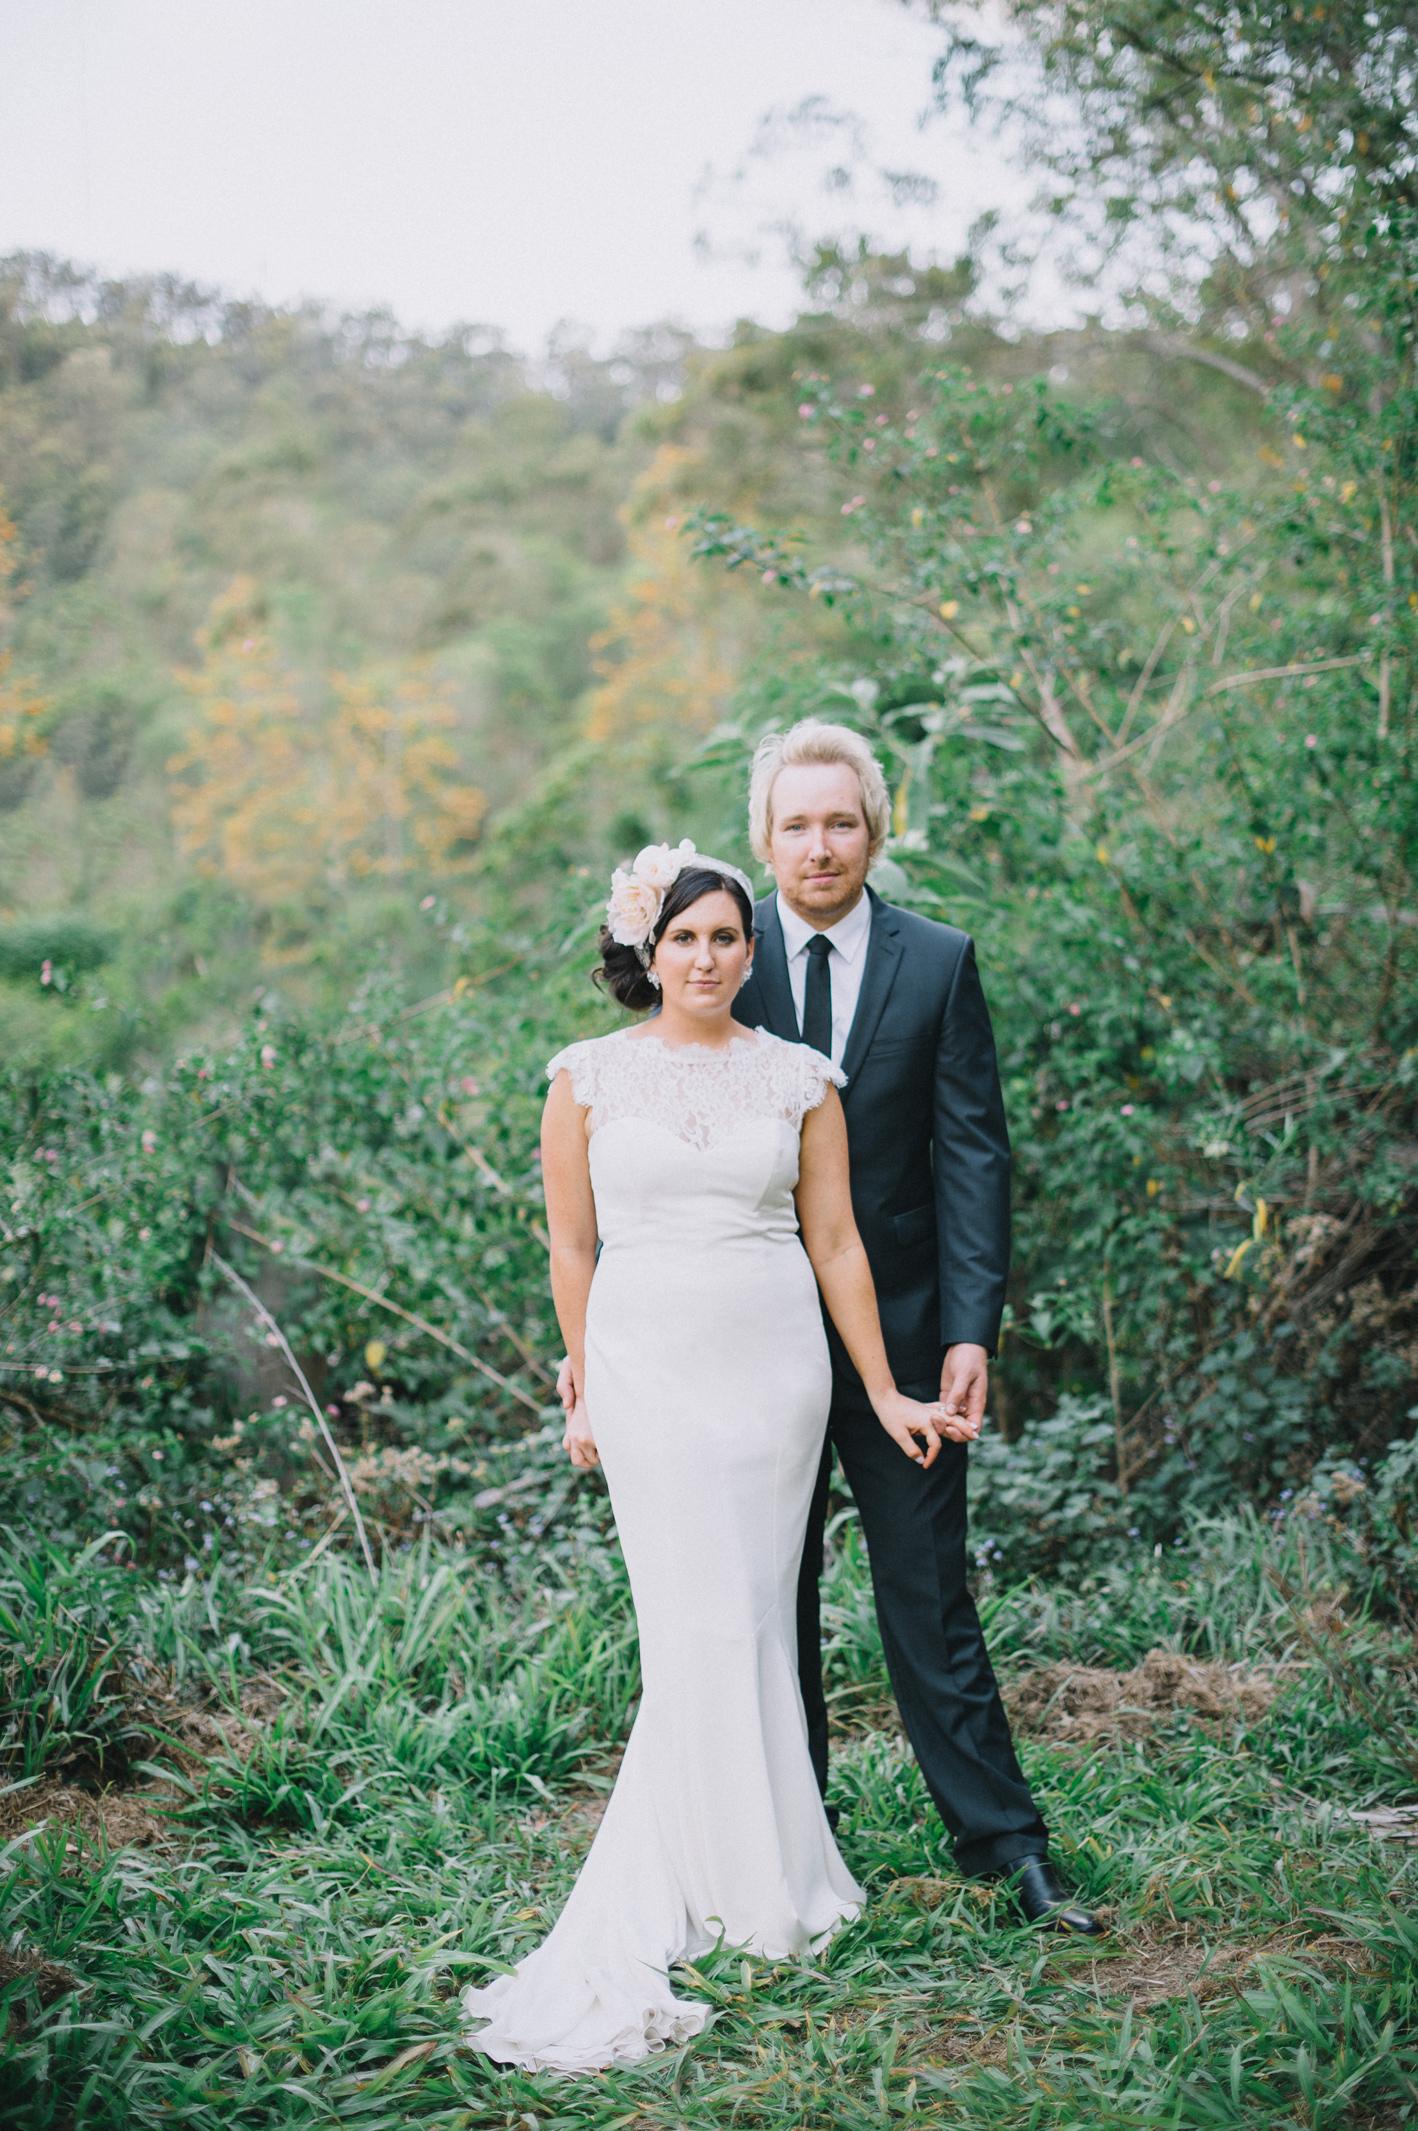 079-hannah-daniel-boomerang-farm-wedding-sophie-baker-photography